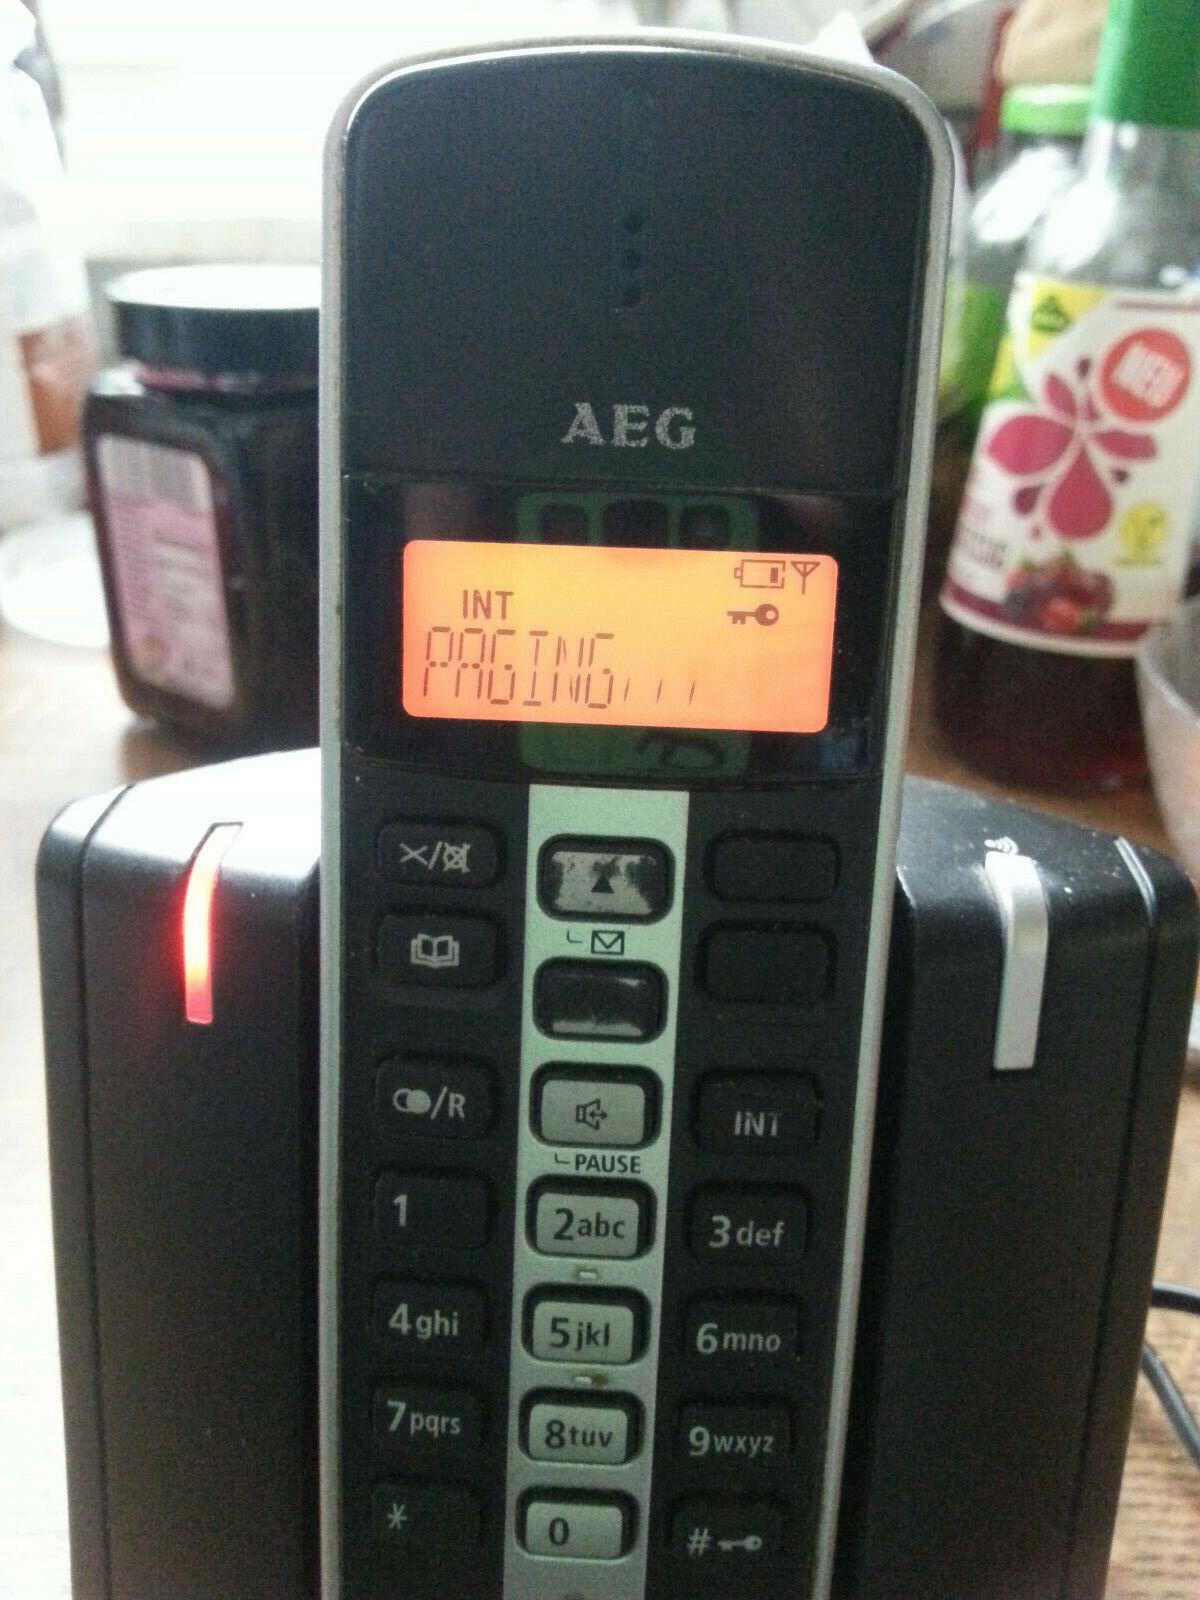 AEG Schnurlos Telefon Tara 200 DECT/GAP mit beleuchteten LCD Display; Batt.-Neu